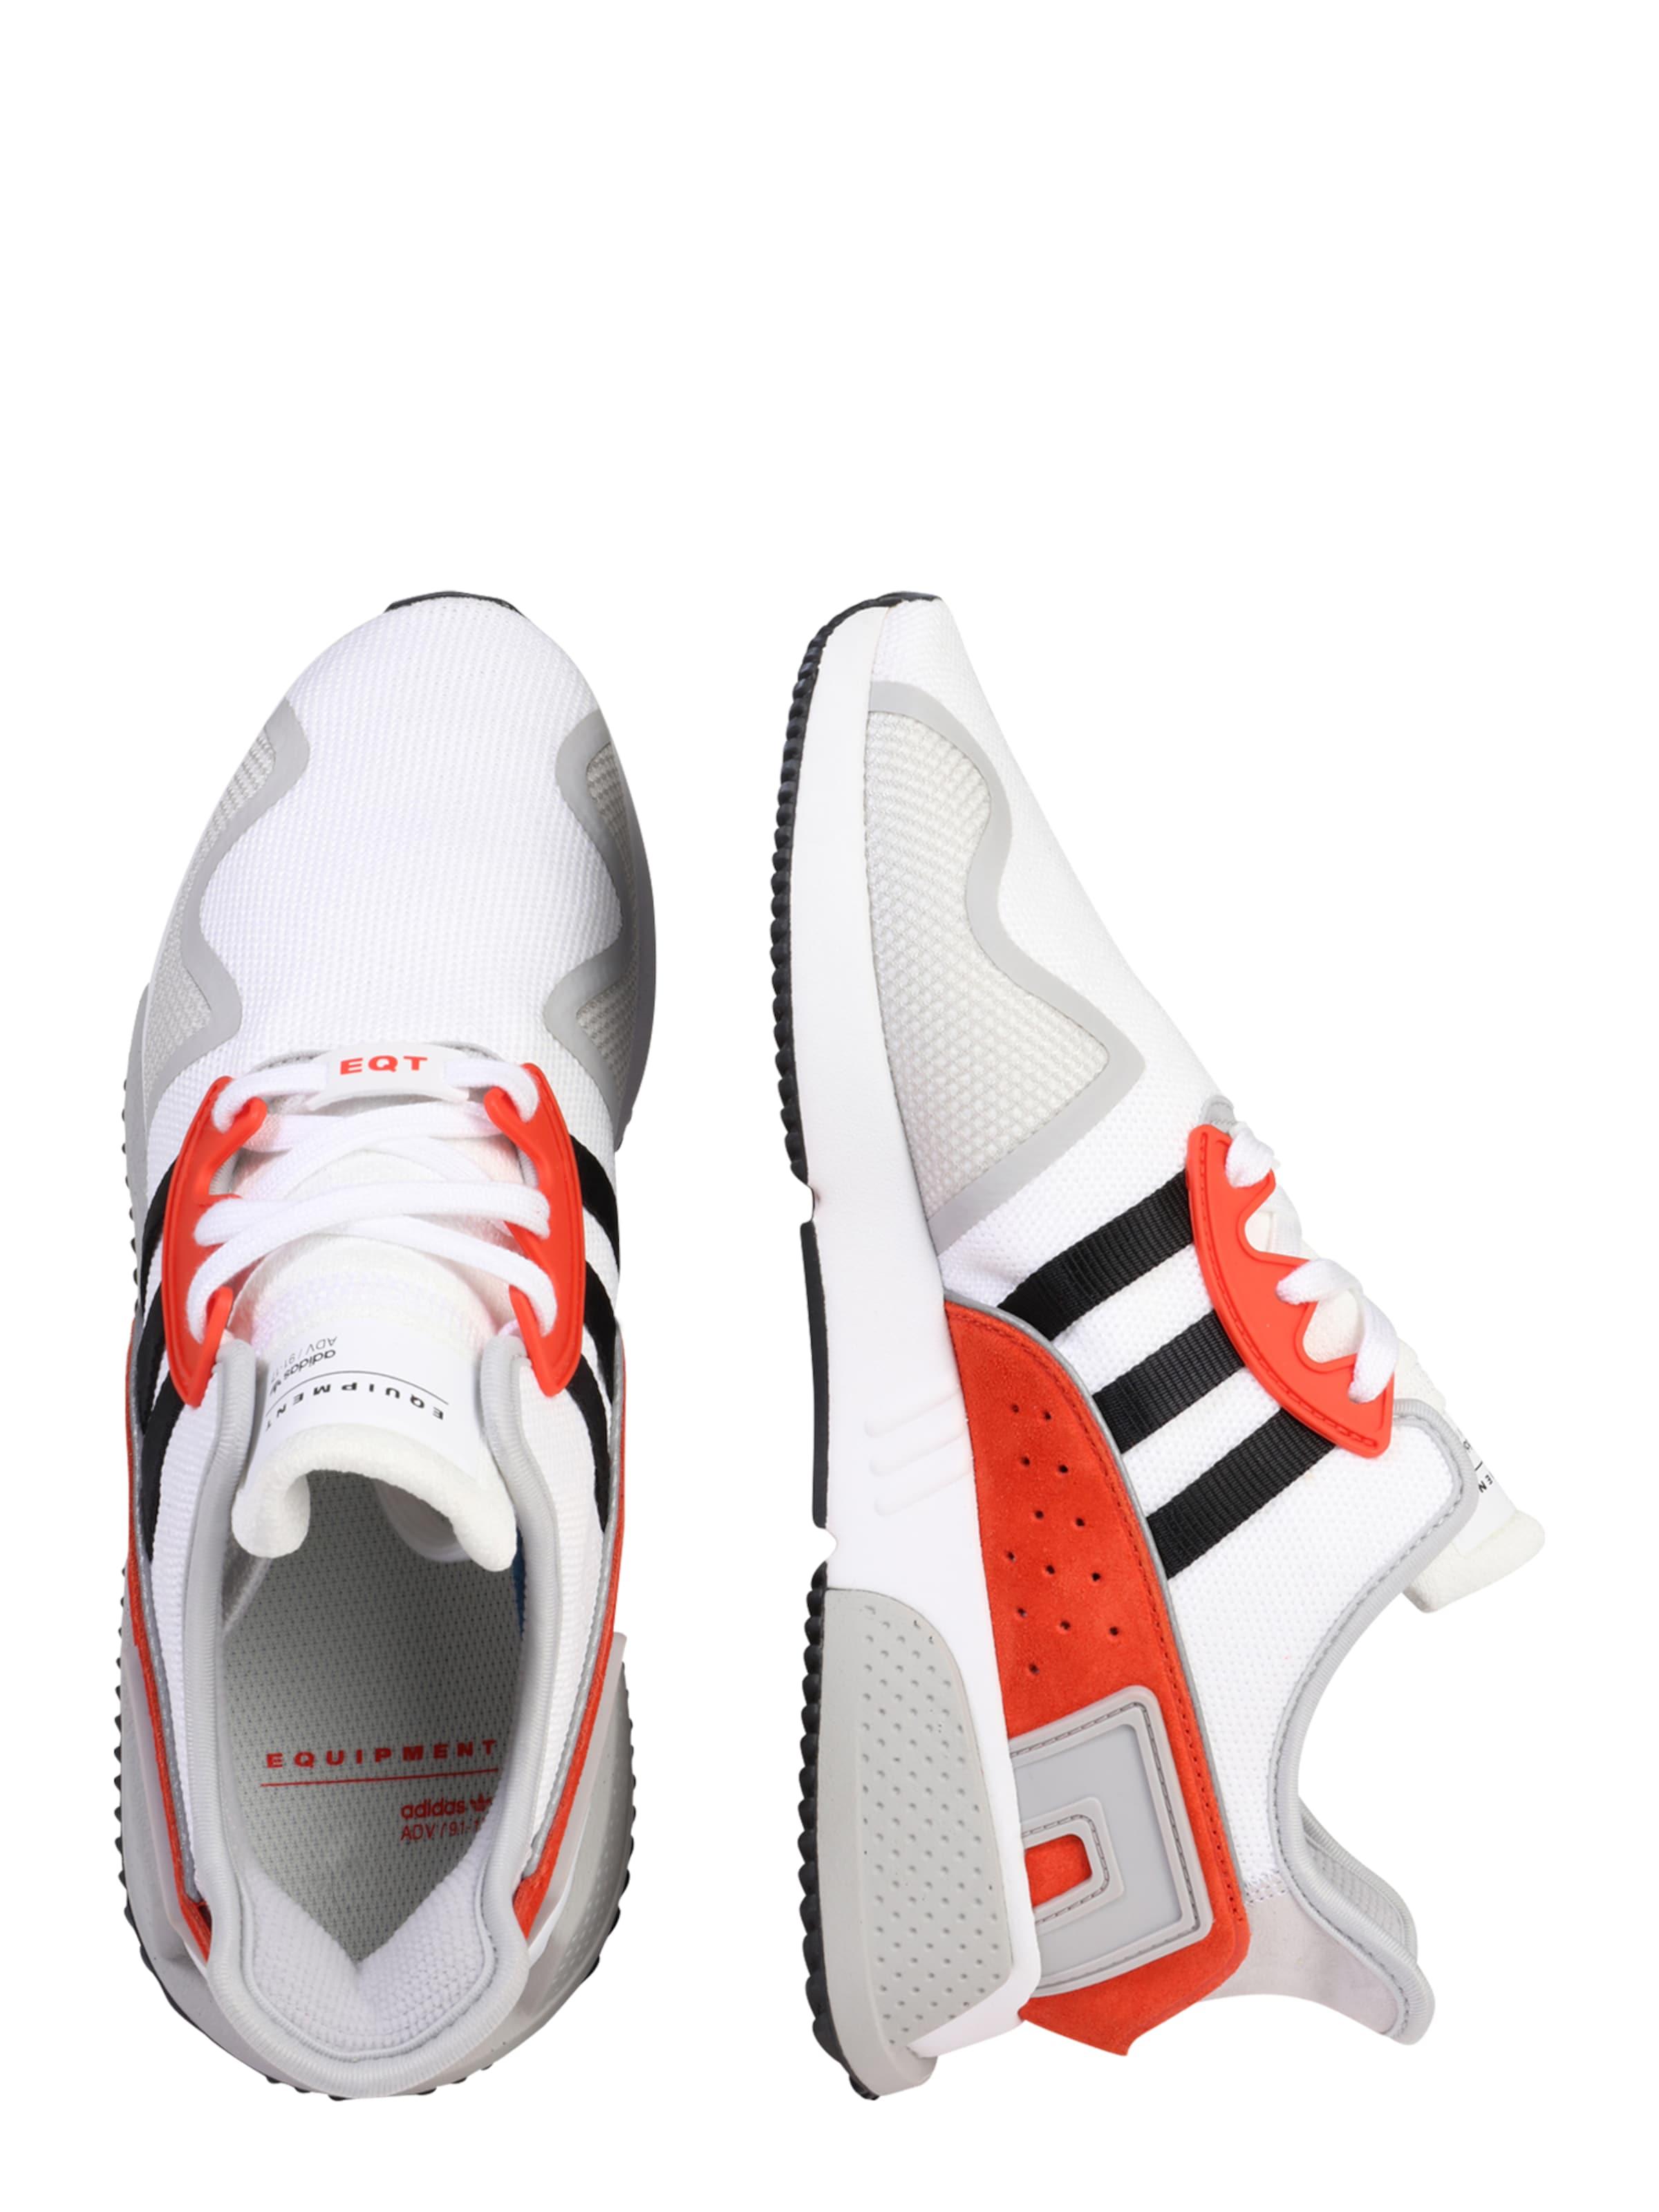 GrisRouge In Blanc 'cushion' Adidas OriginalsBaskets Basses rdCtshQ